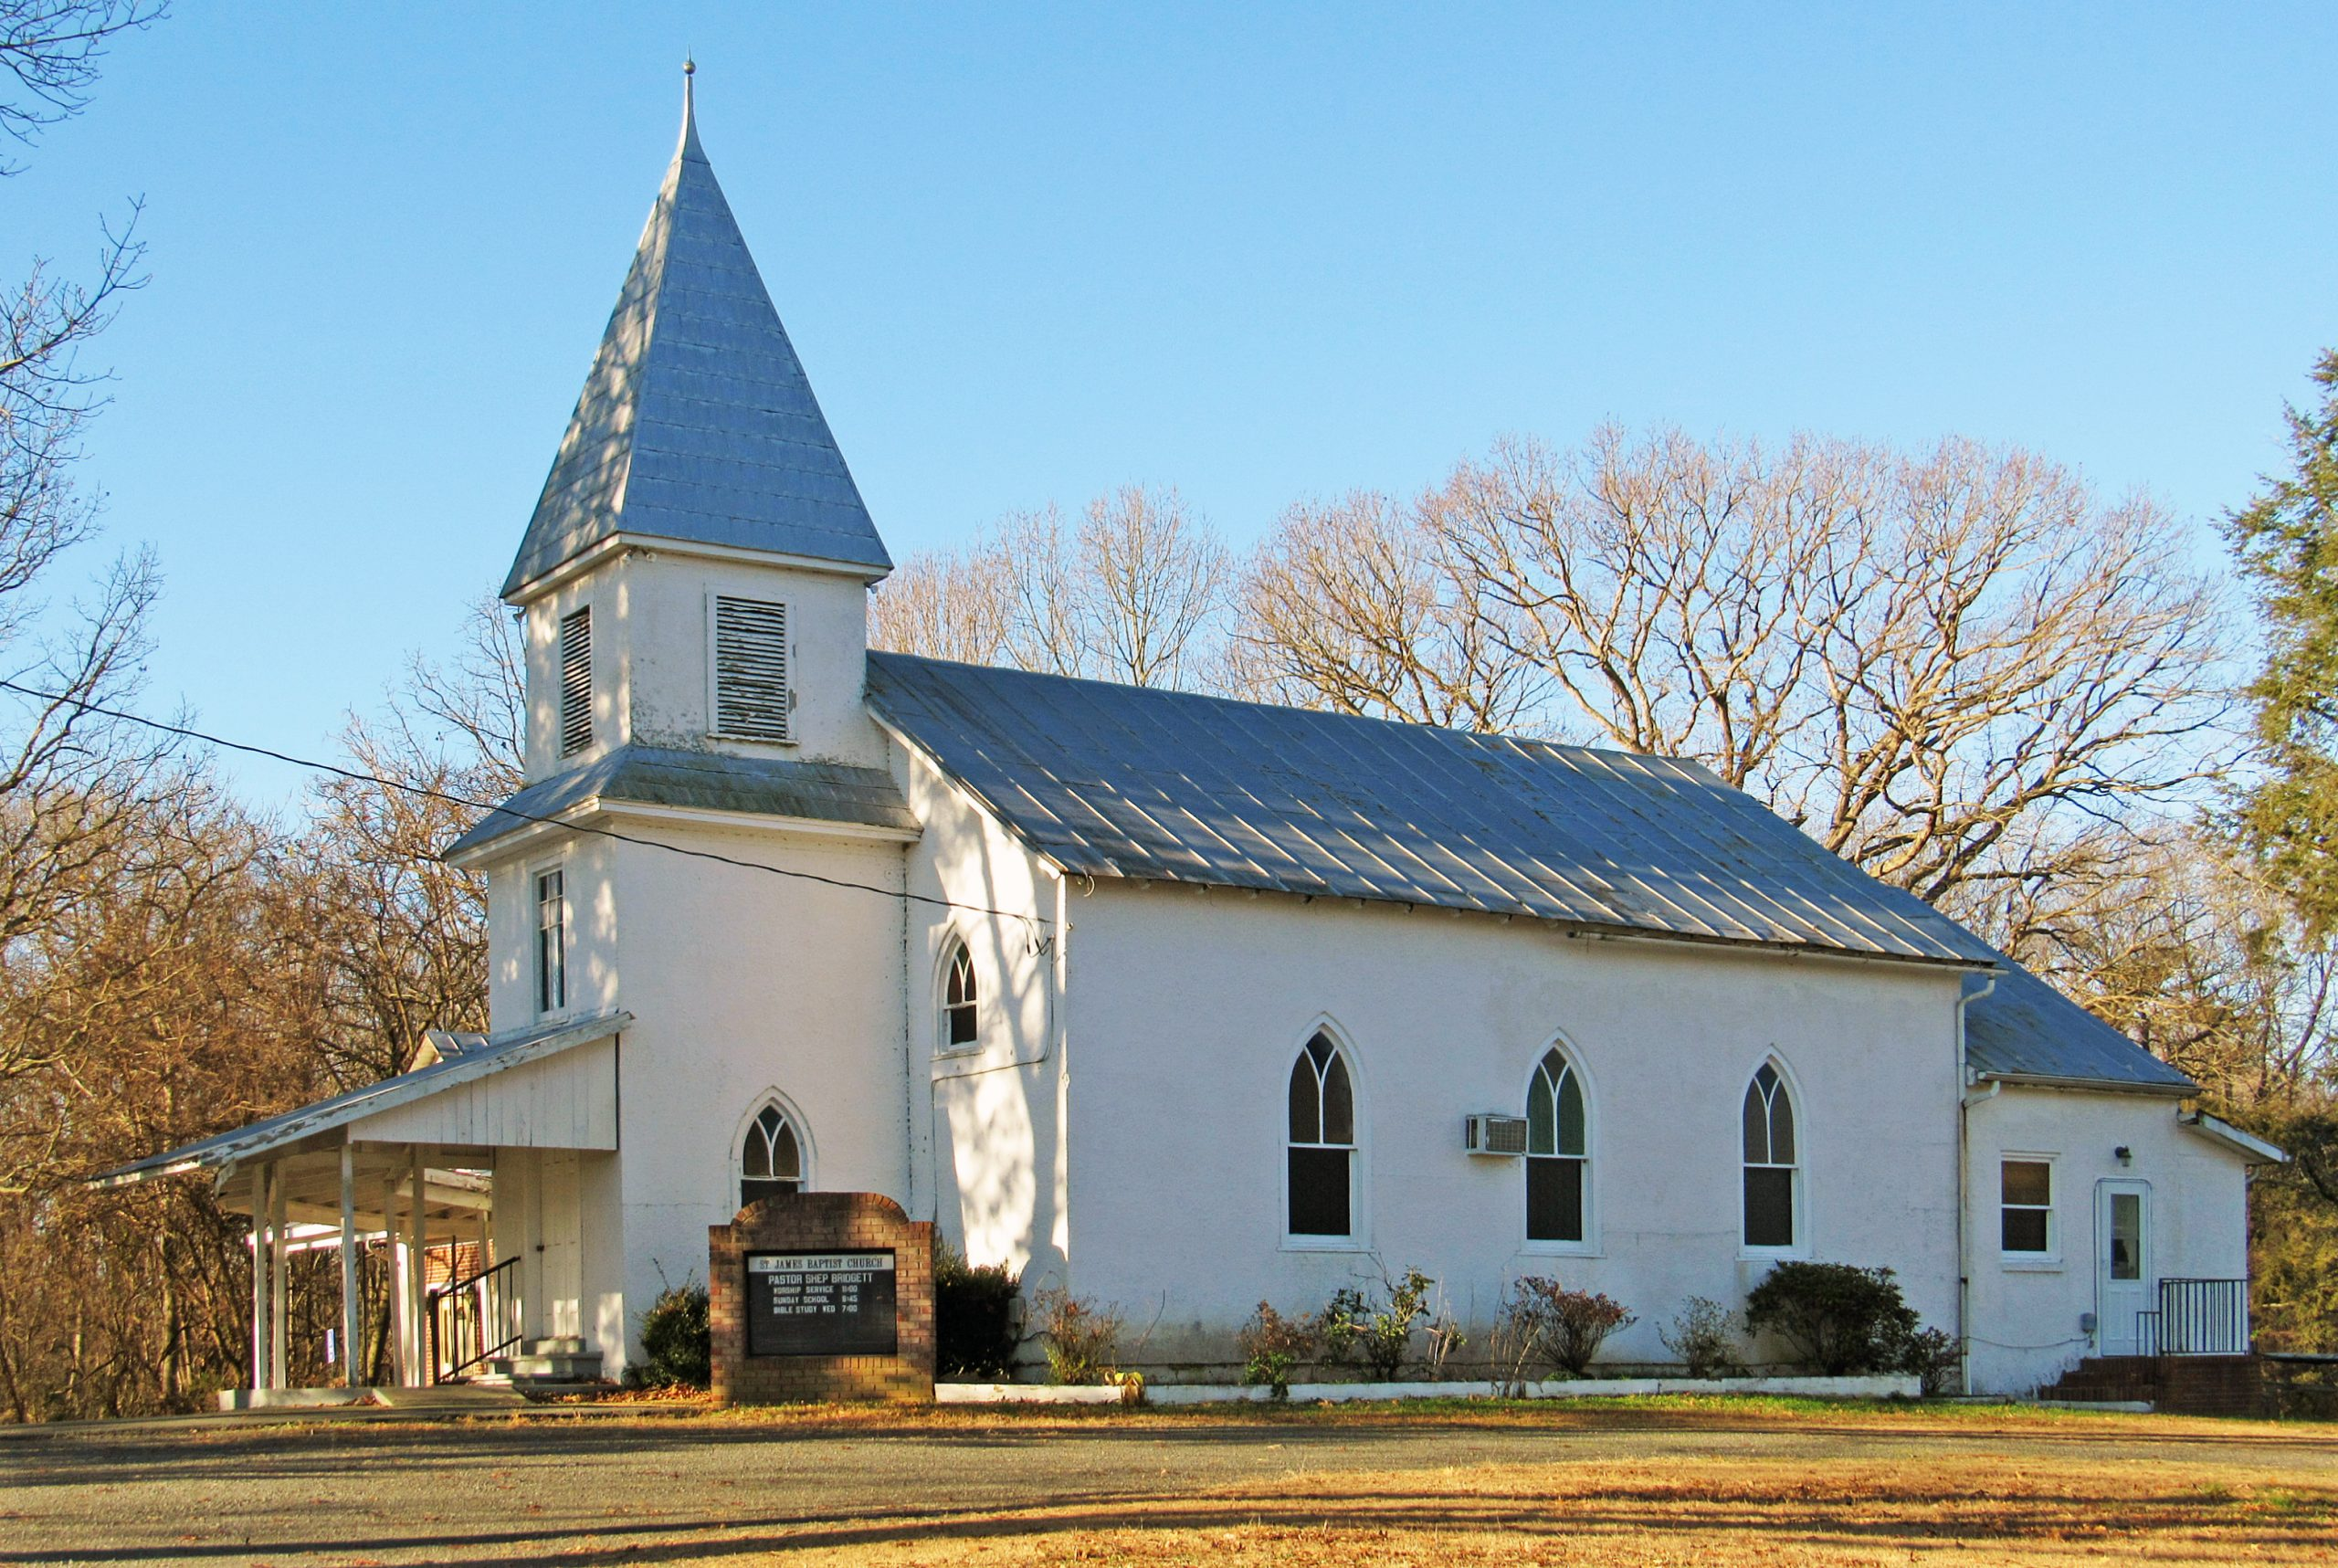 St. James Baptist Church and Cemetery